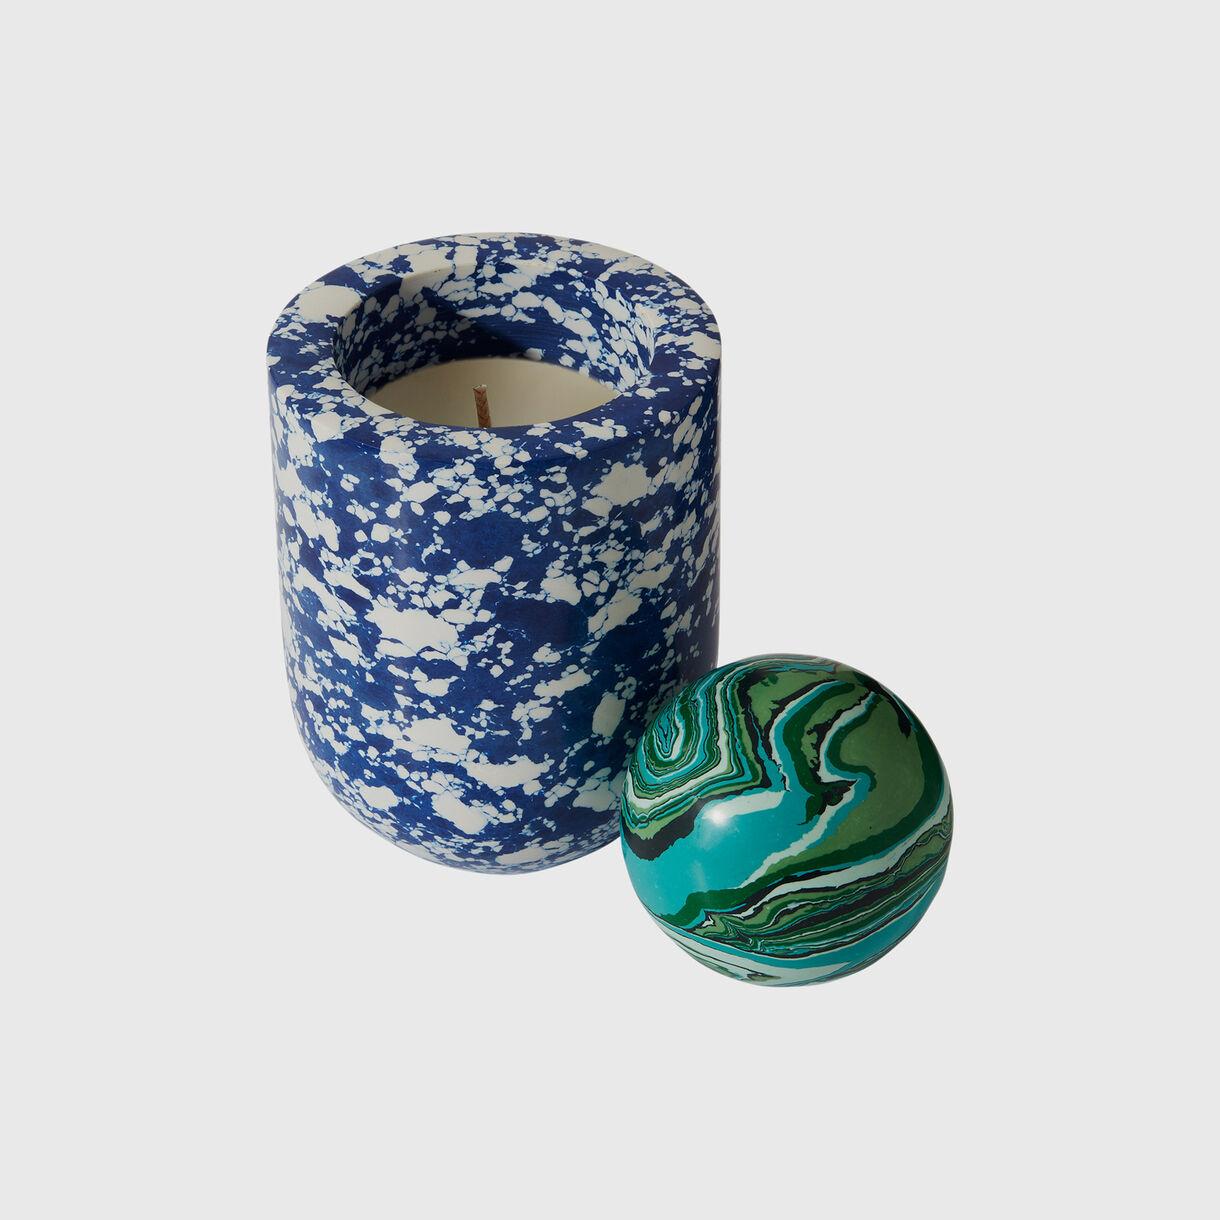 Swirl Ball Candle